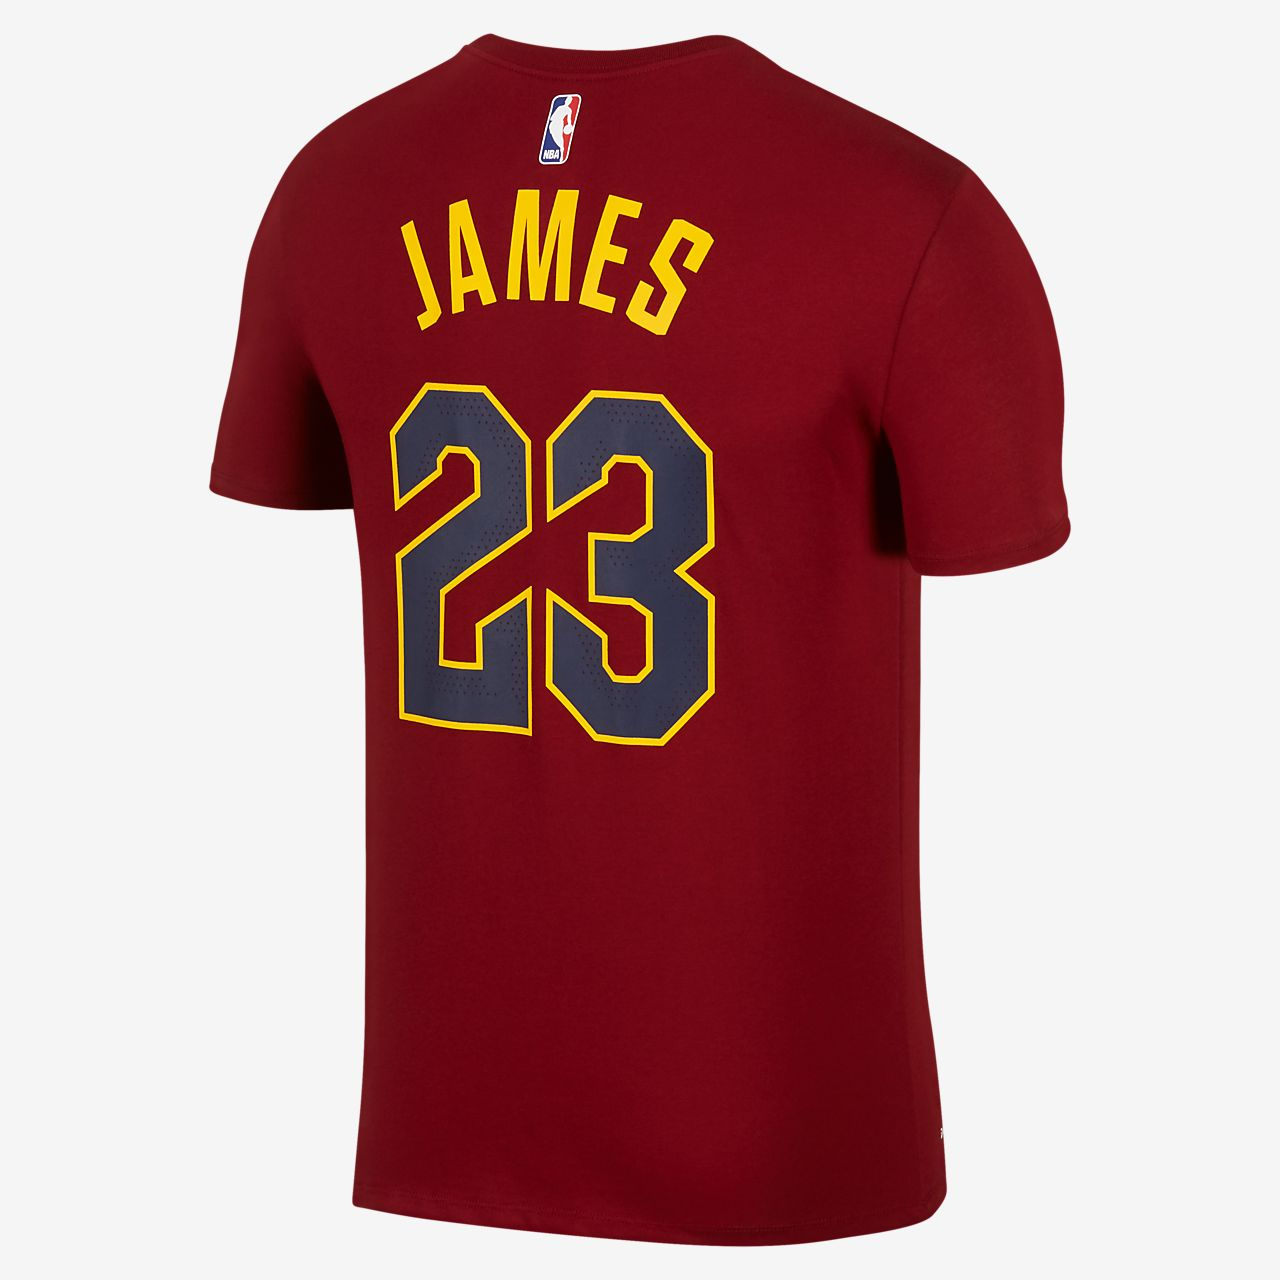 nike dry nba cavaliers james men s basketball t shirt nike com rh nike com nike basketball tee shirts nike basketball t shirts australia